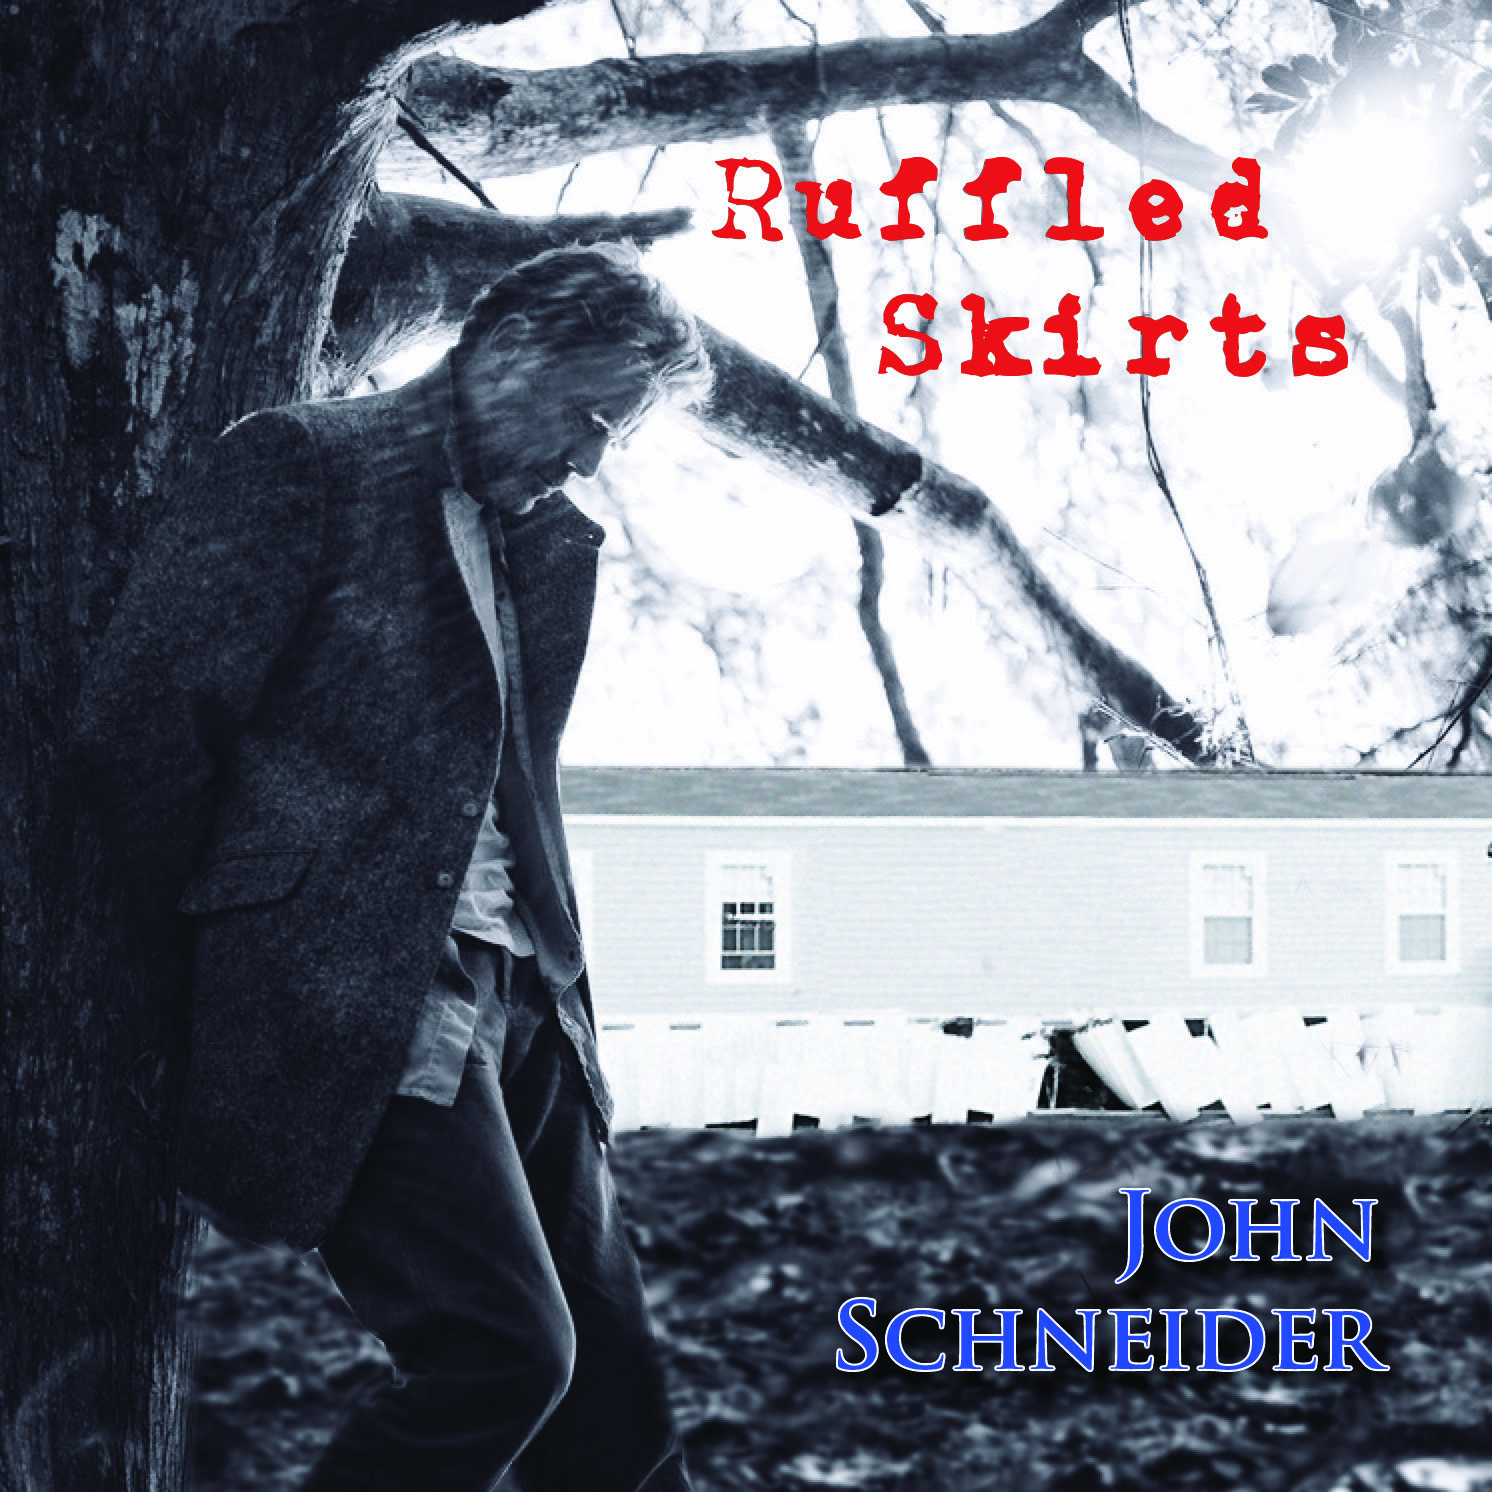 John Schneider - Ruffled Skirts